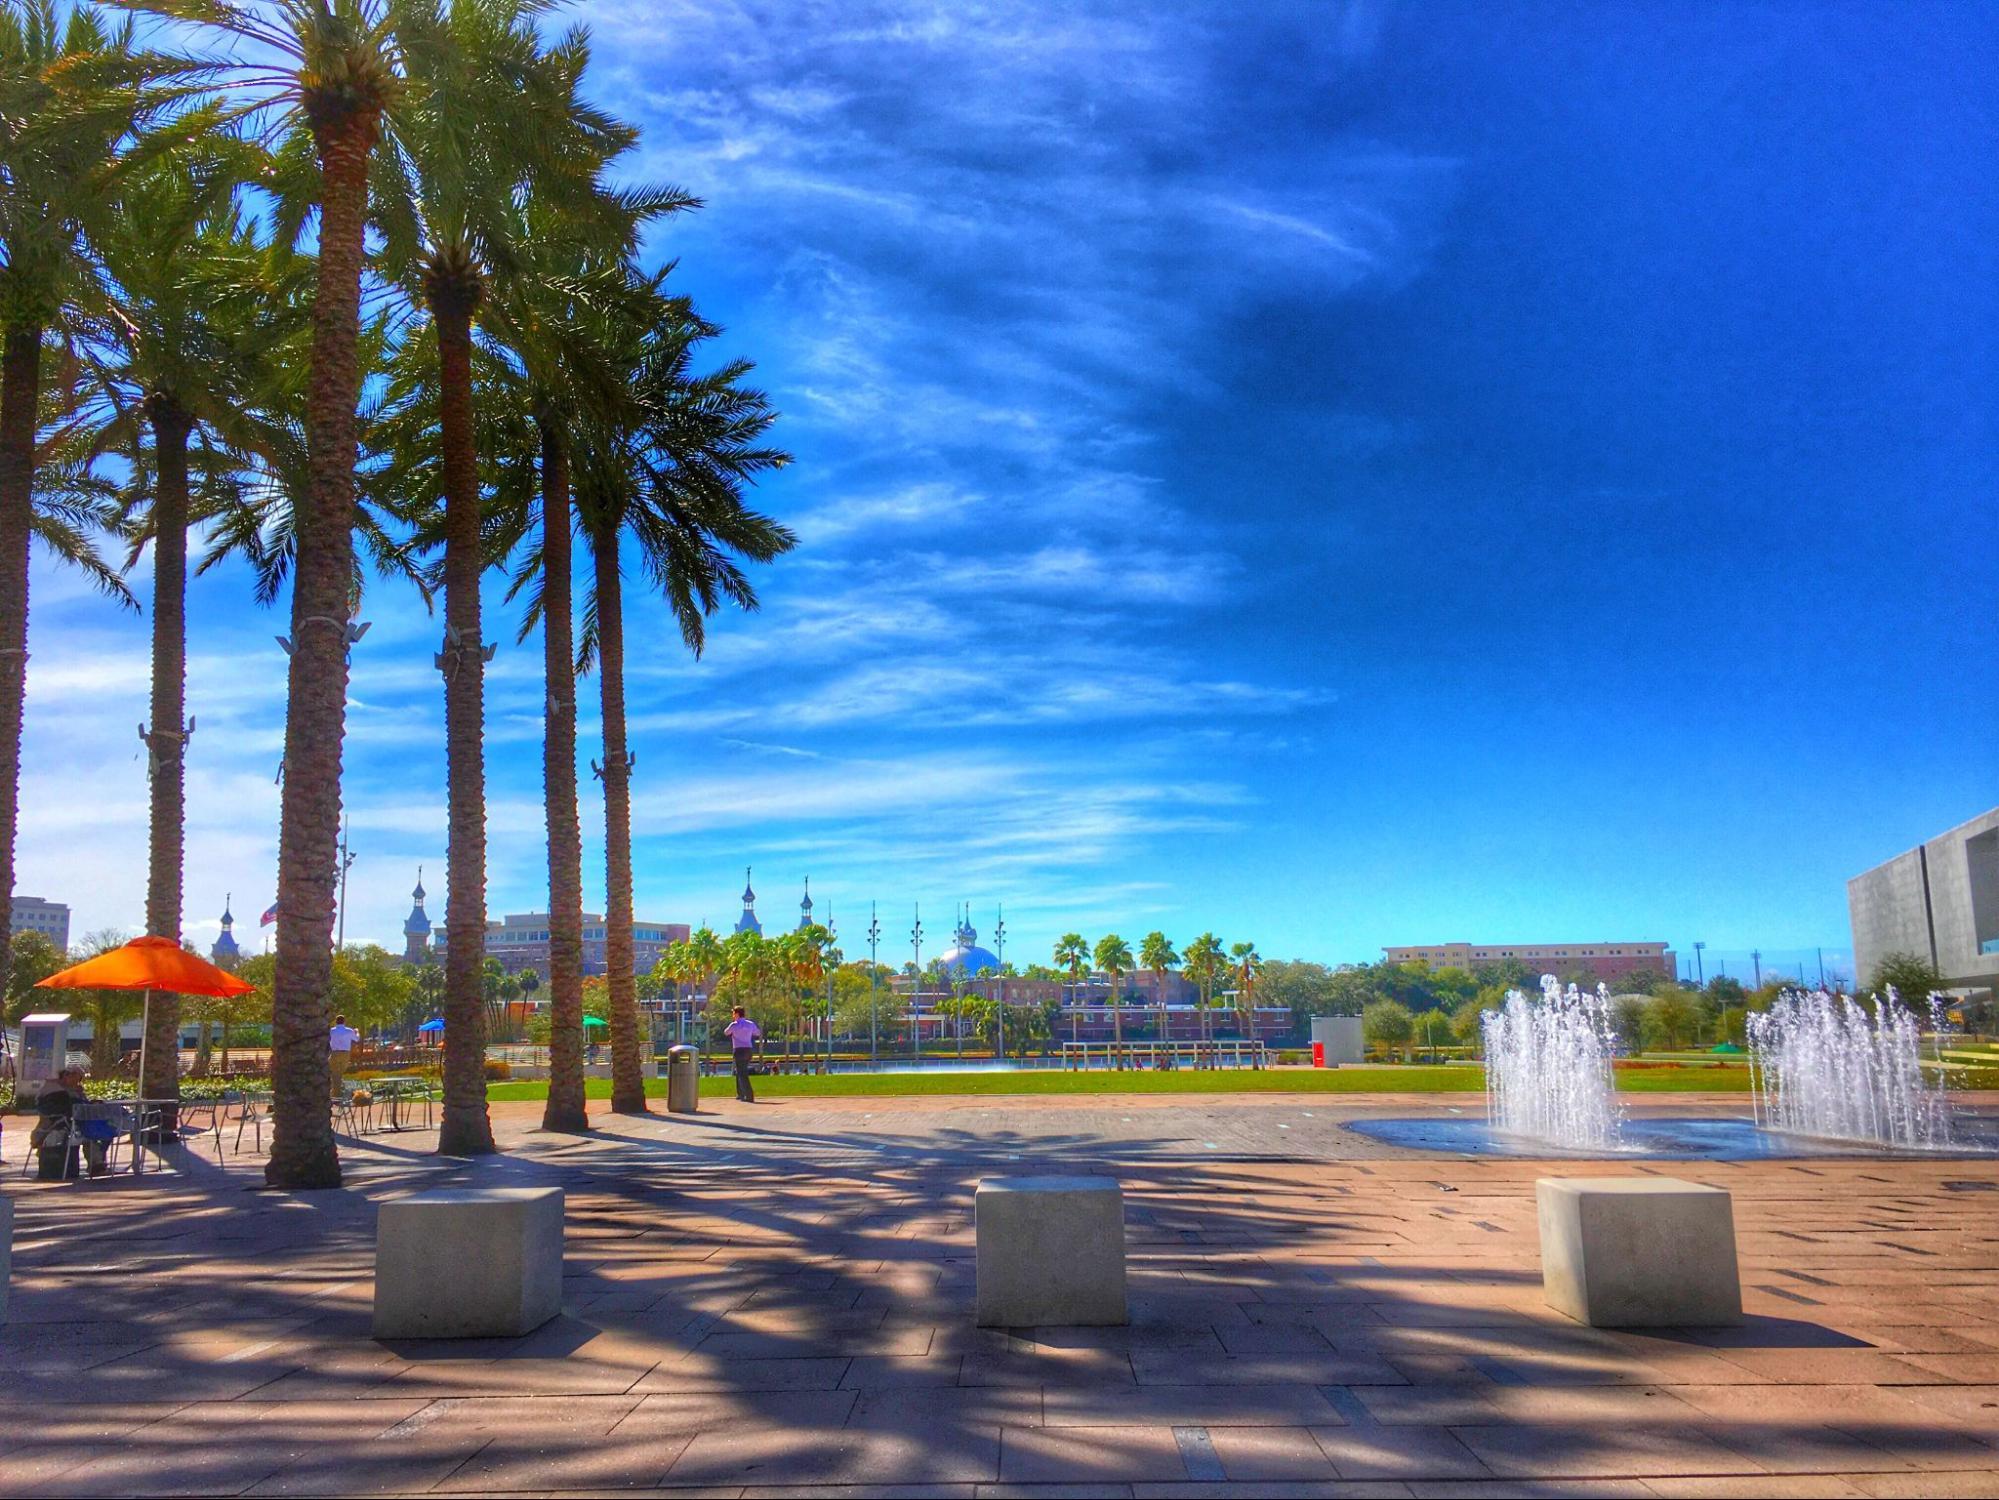 View of Tampa, Florida